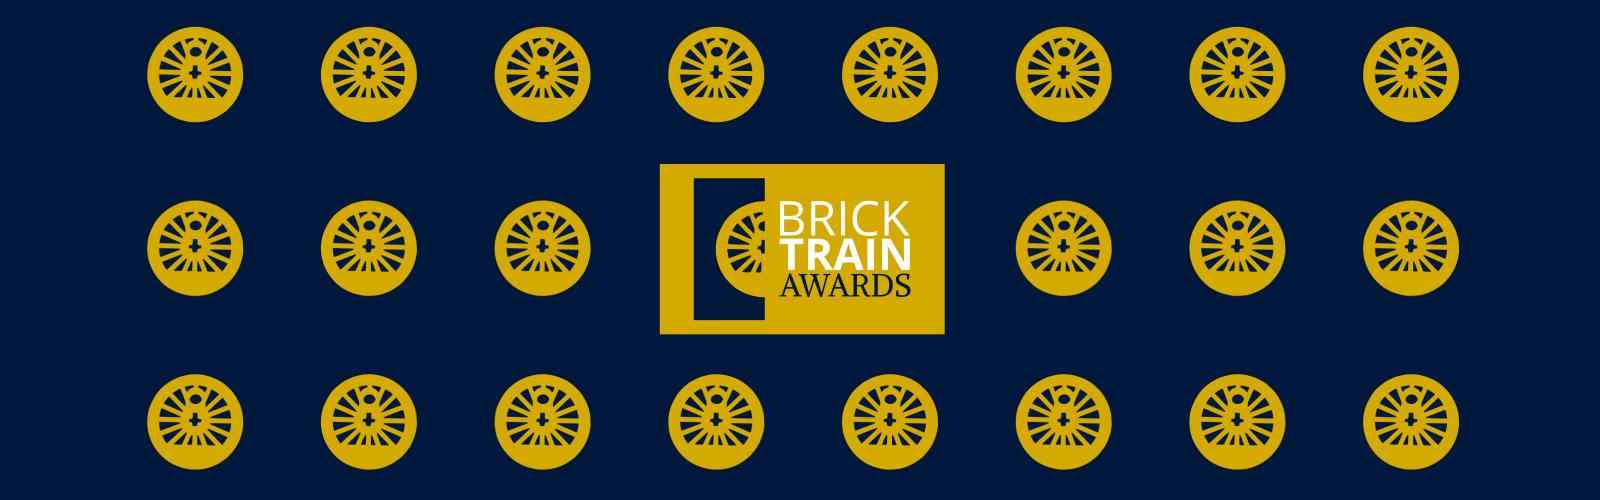 Brick Train Awards - awards for LEGO train builders